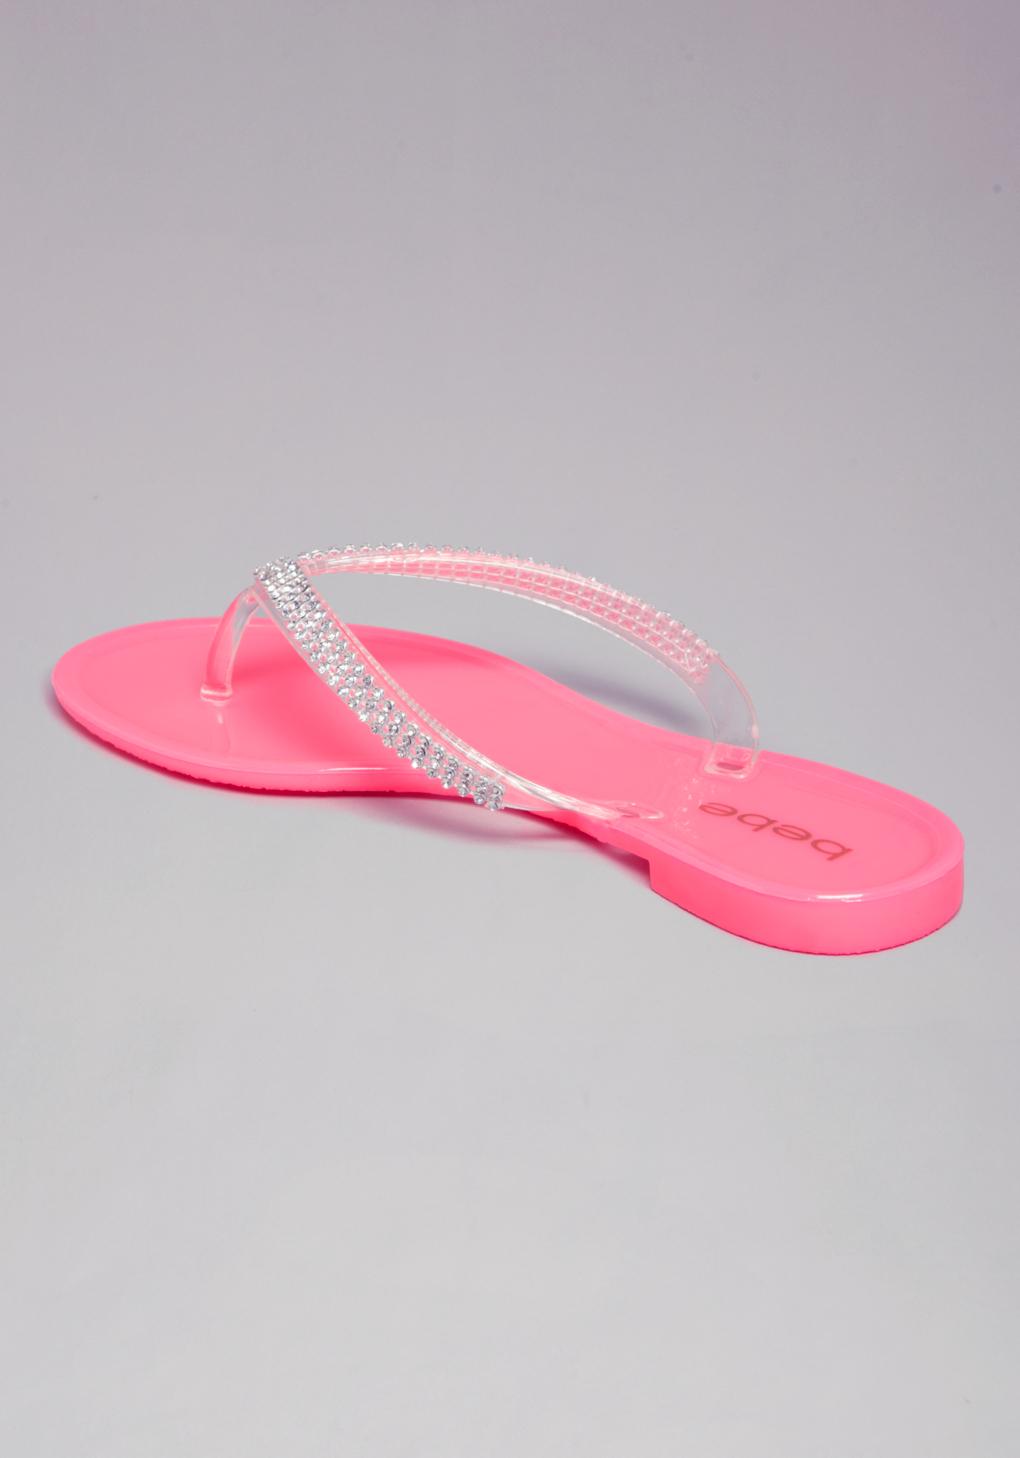 Bebe Audriella Jelly Flip Flops In Pink Lyst